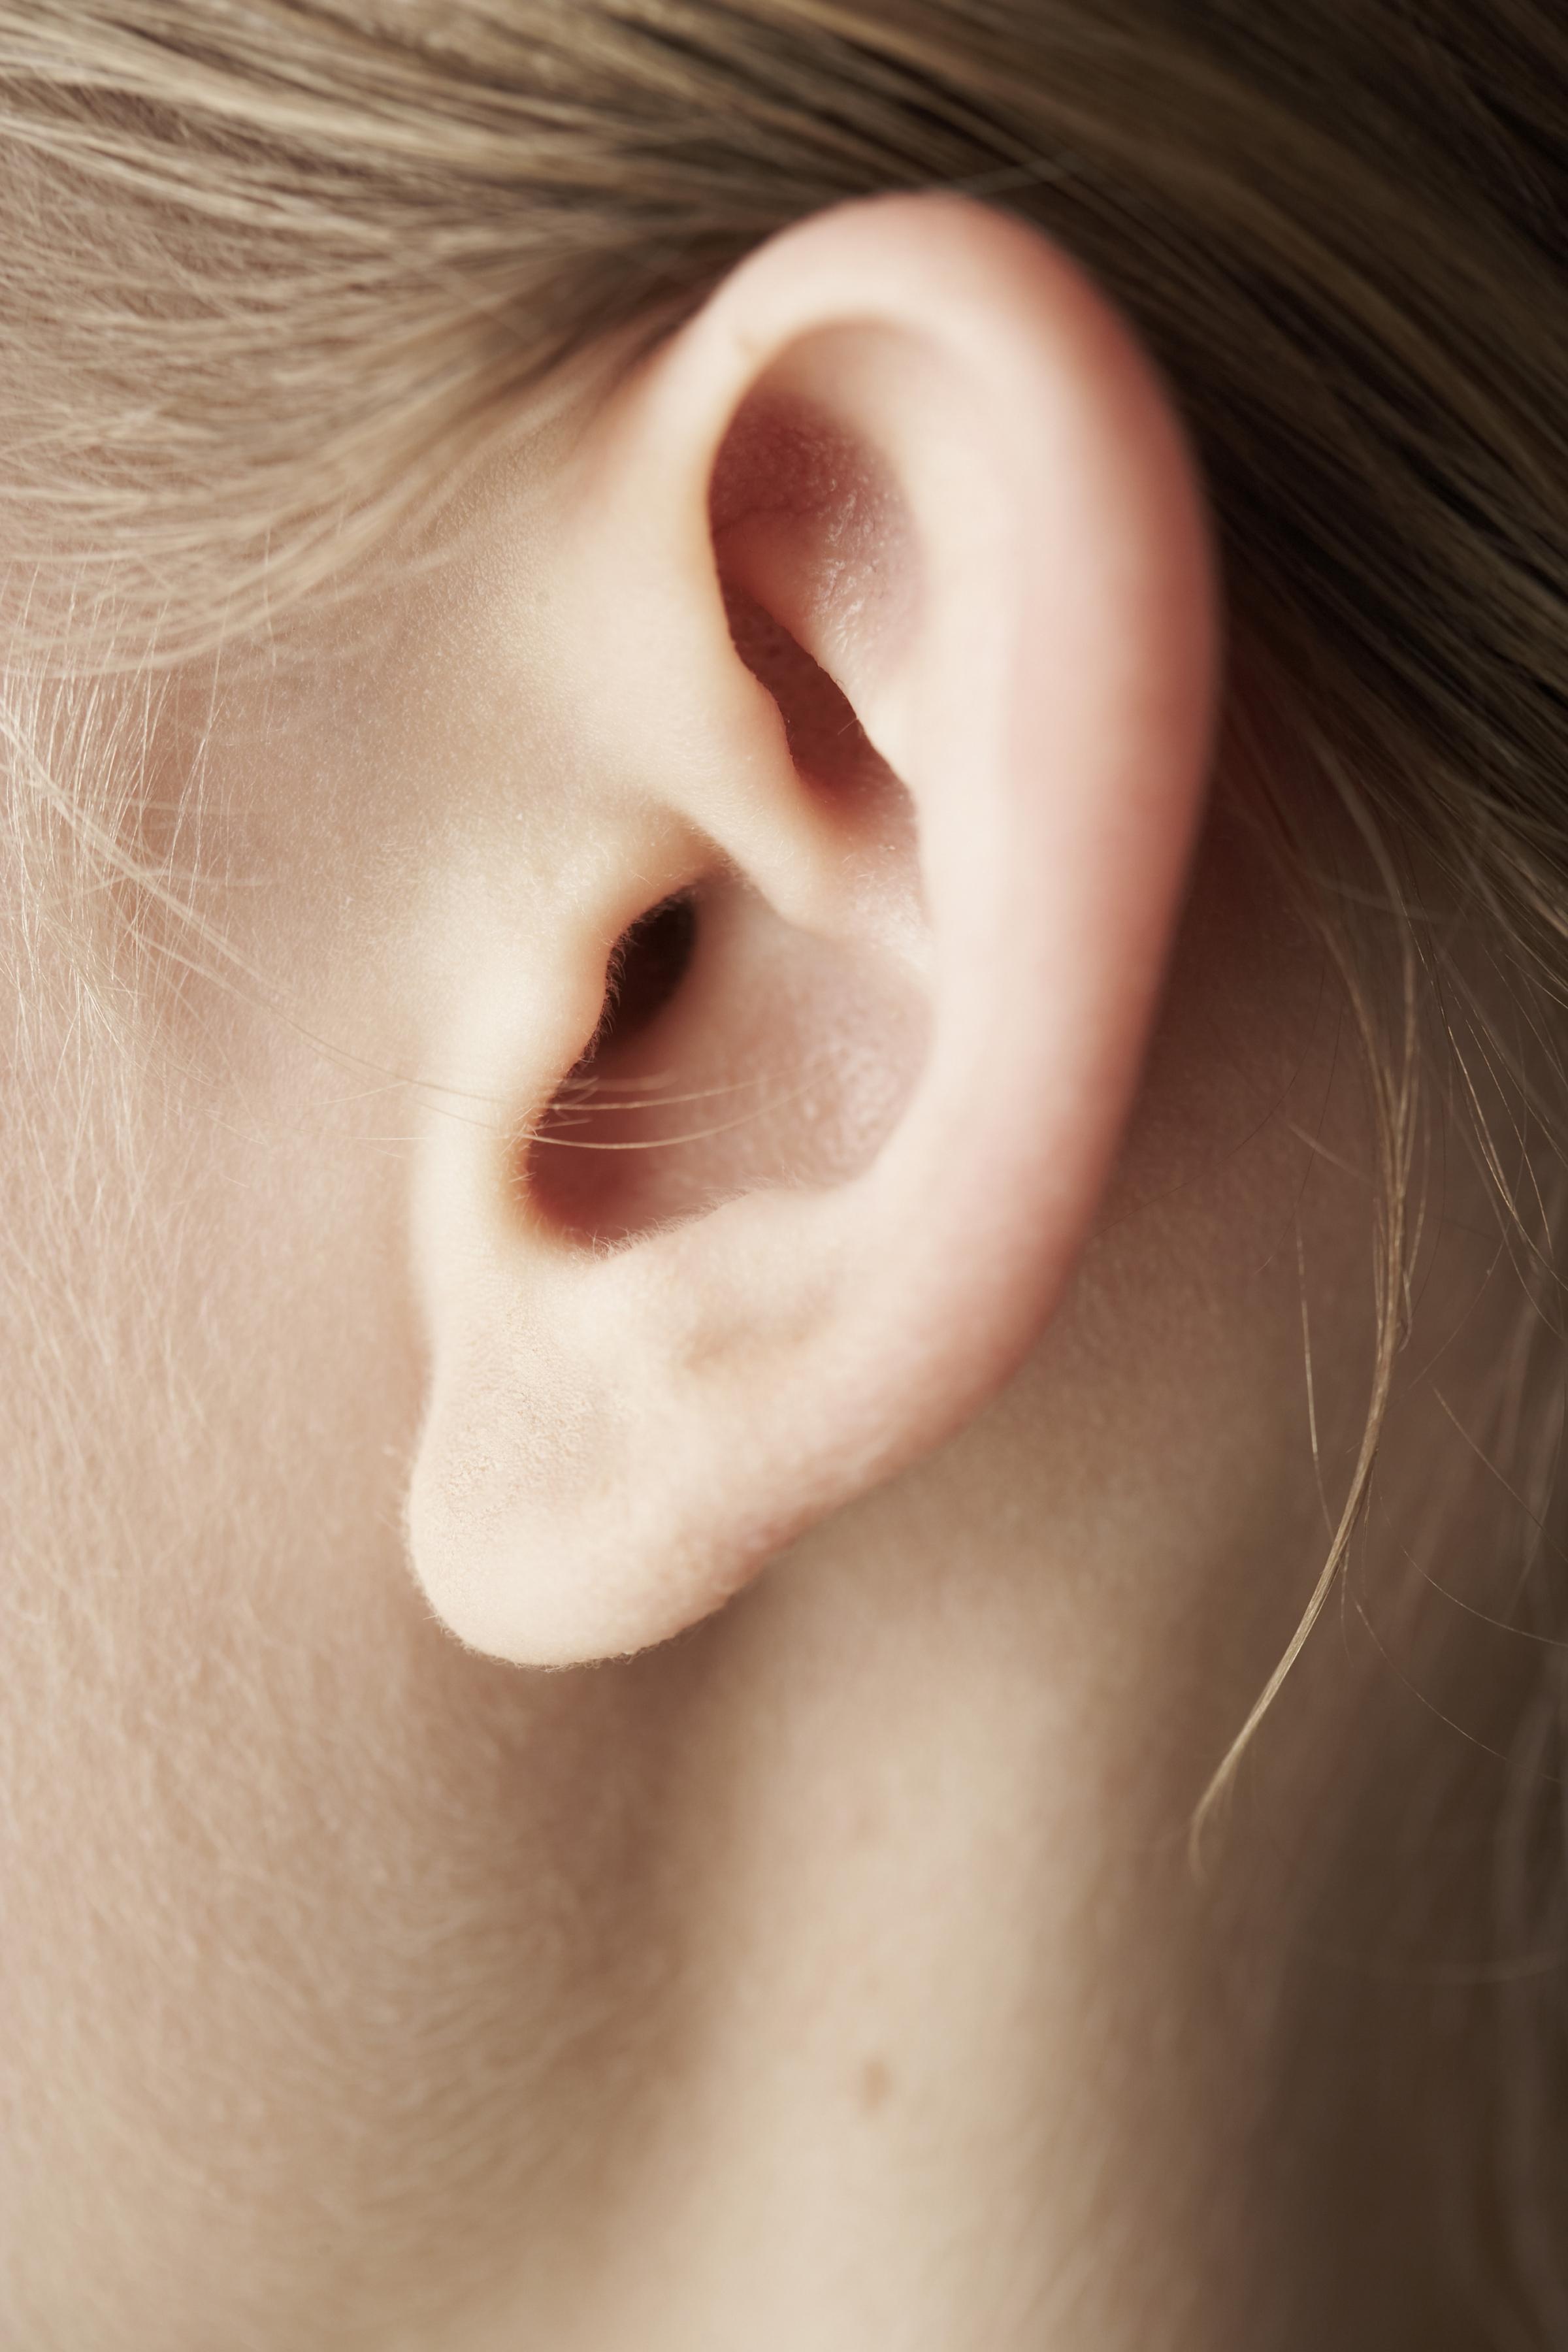 How to Get Rid of Keloids From Industrial Piercings